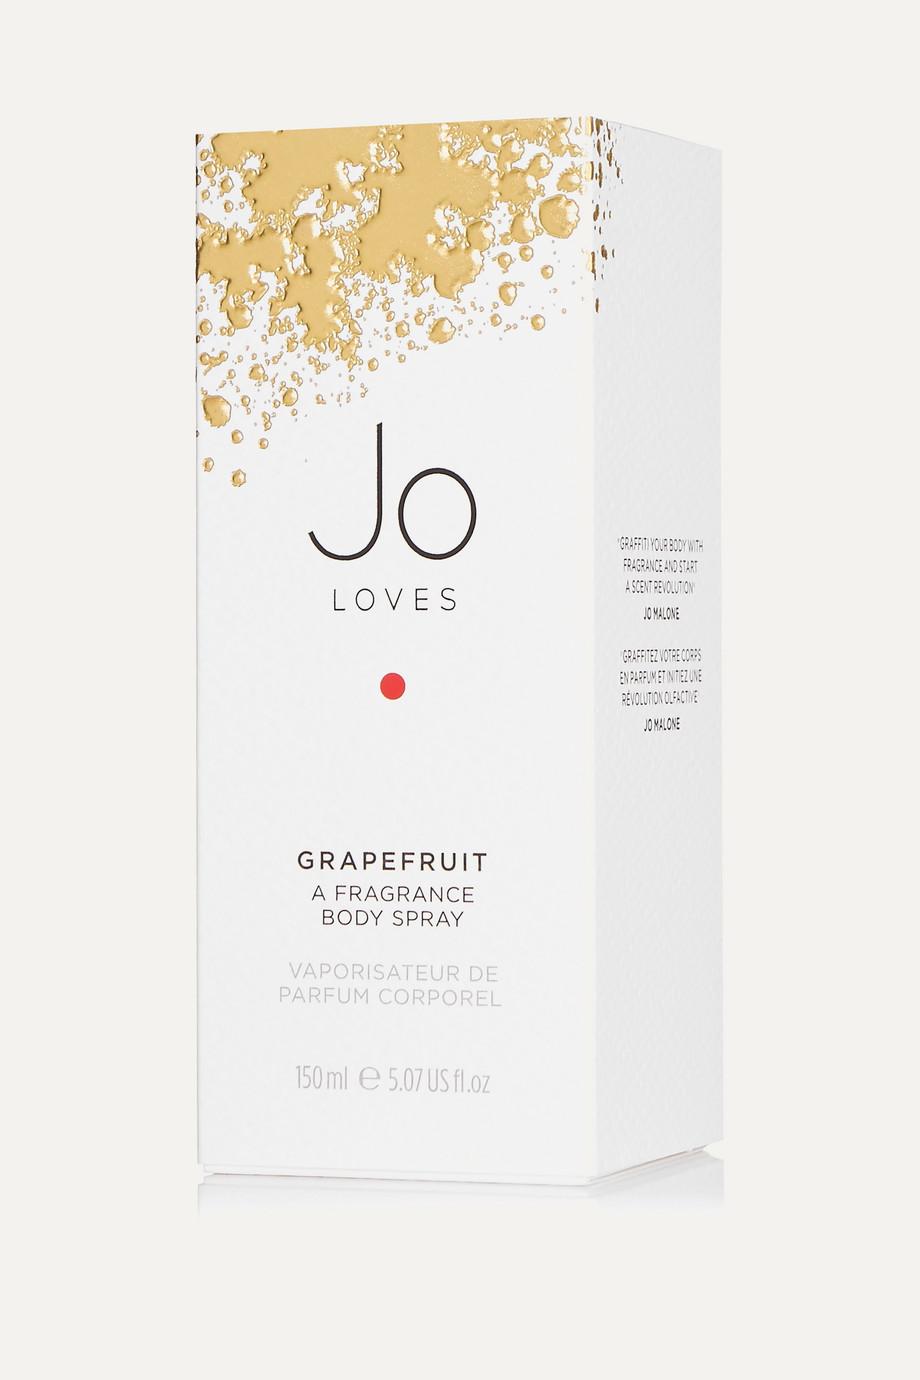 Jo Loves A Fragrance Body Spray - Grapefruit, 150ml